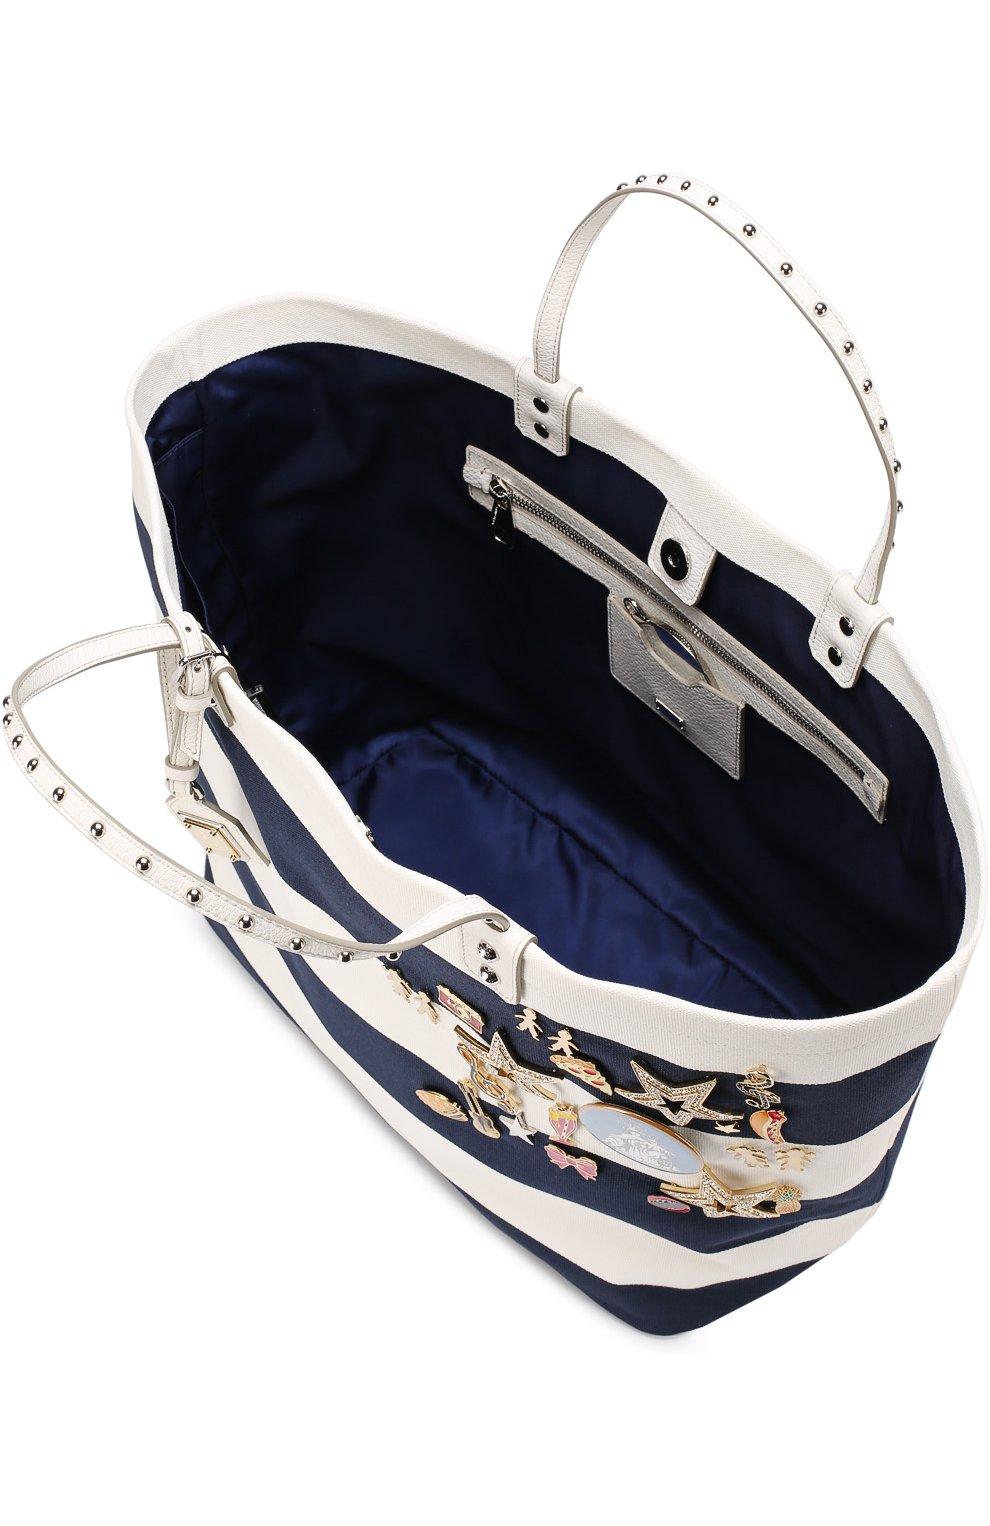 Текстильная сумка Beatrice с металлическим декором Dolce & Gabbana синяя цвета | Фото №3